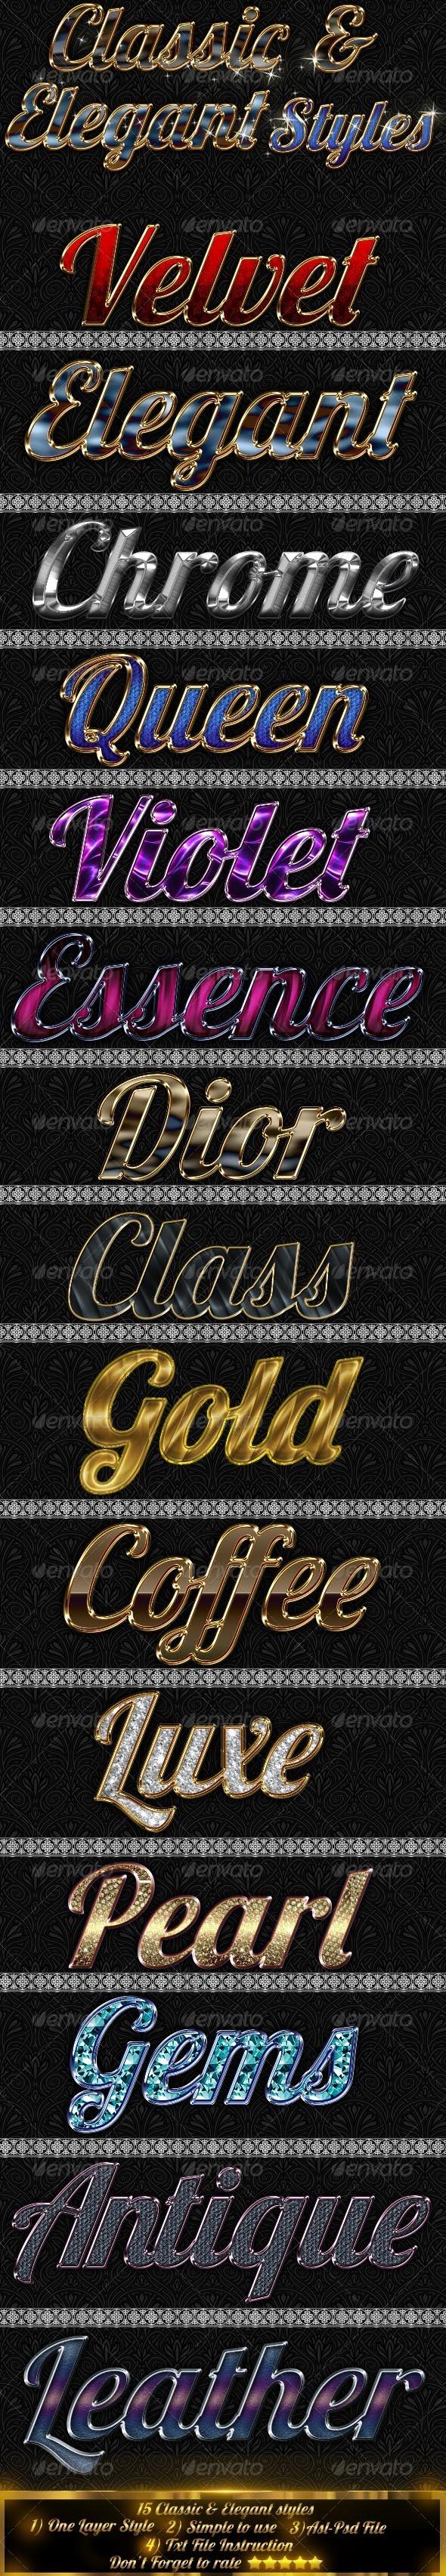 GraphicRiver Classic & Elegant Styles 4441336